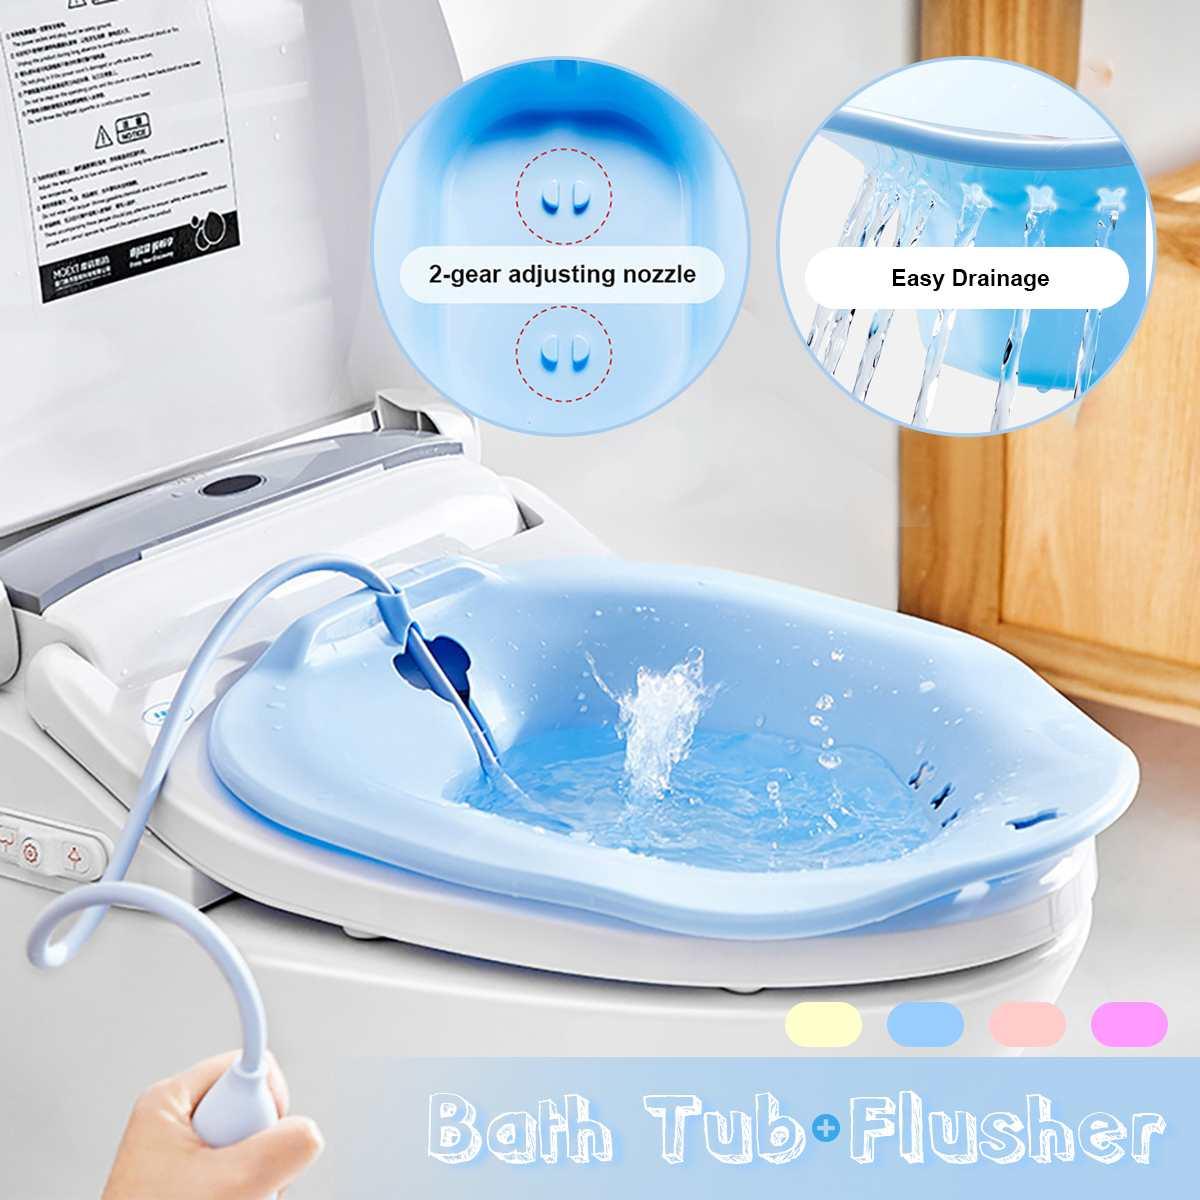 Sitz Ванна хип Ванна флушер Ванна бассейна фумигация ванна для беременных женщин геморрой больные туалет ванная комната